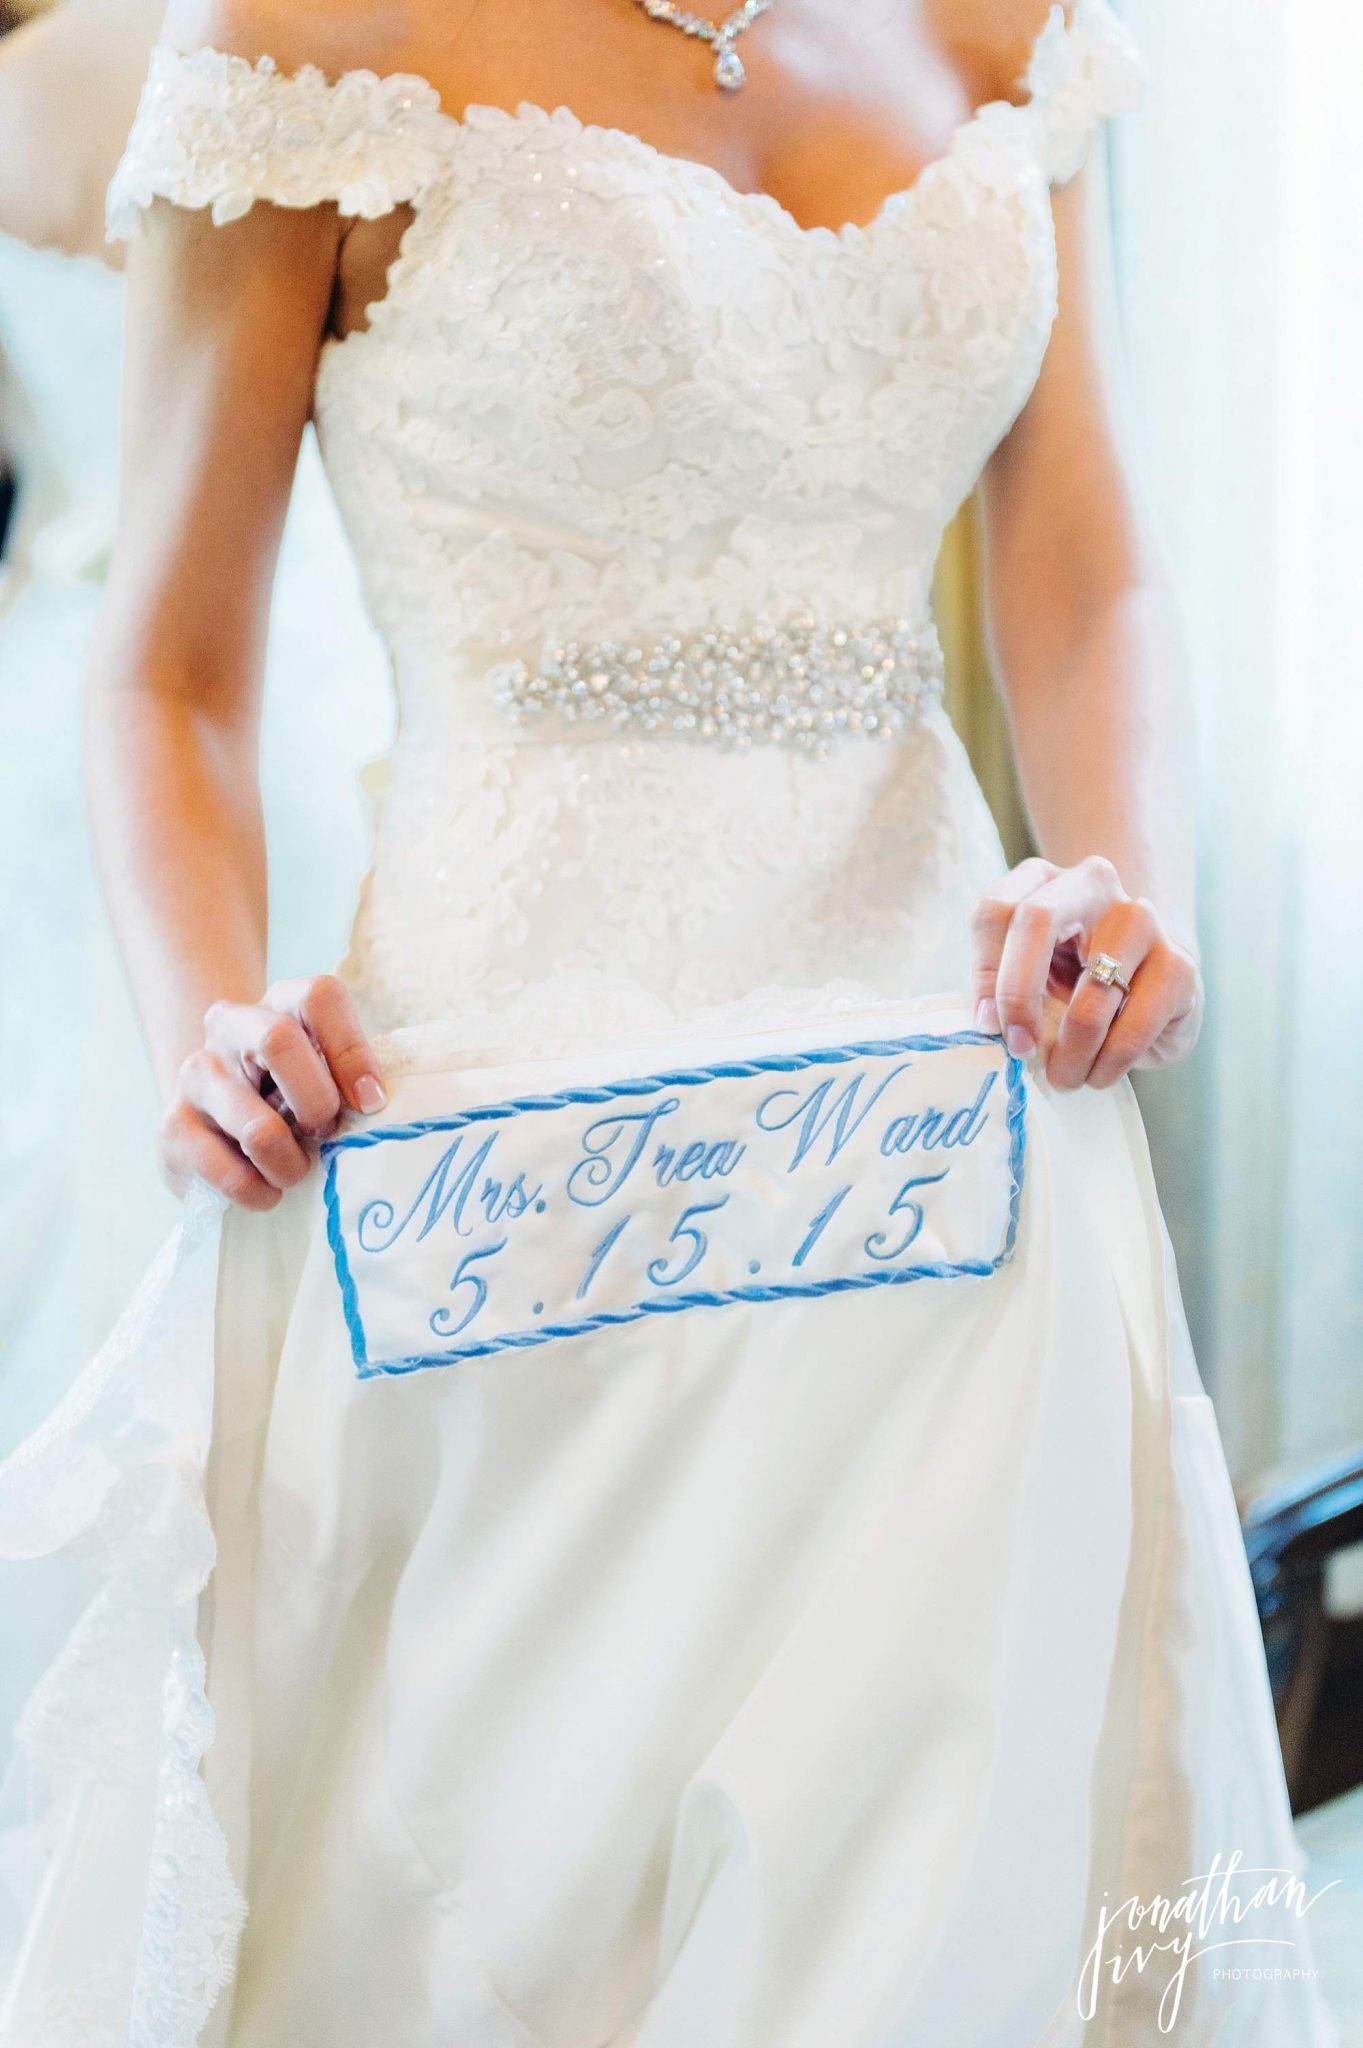 something blue embroidered wedding date on dress hem line